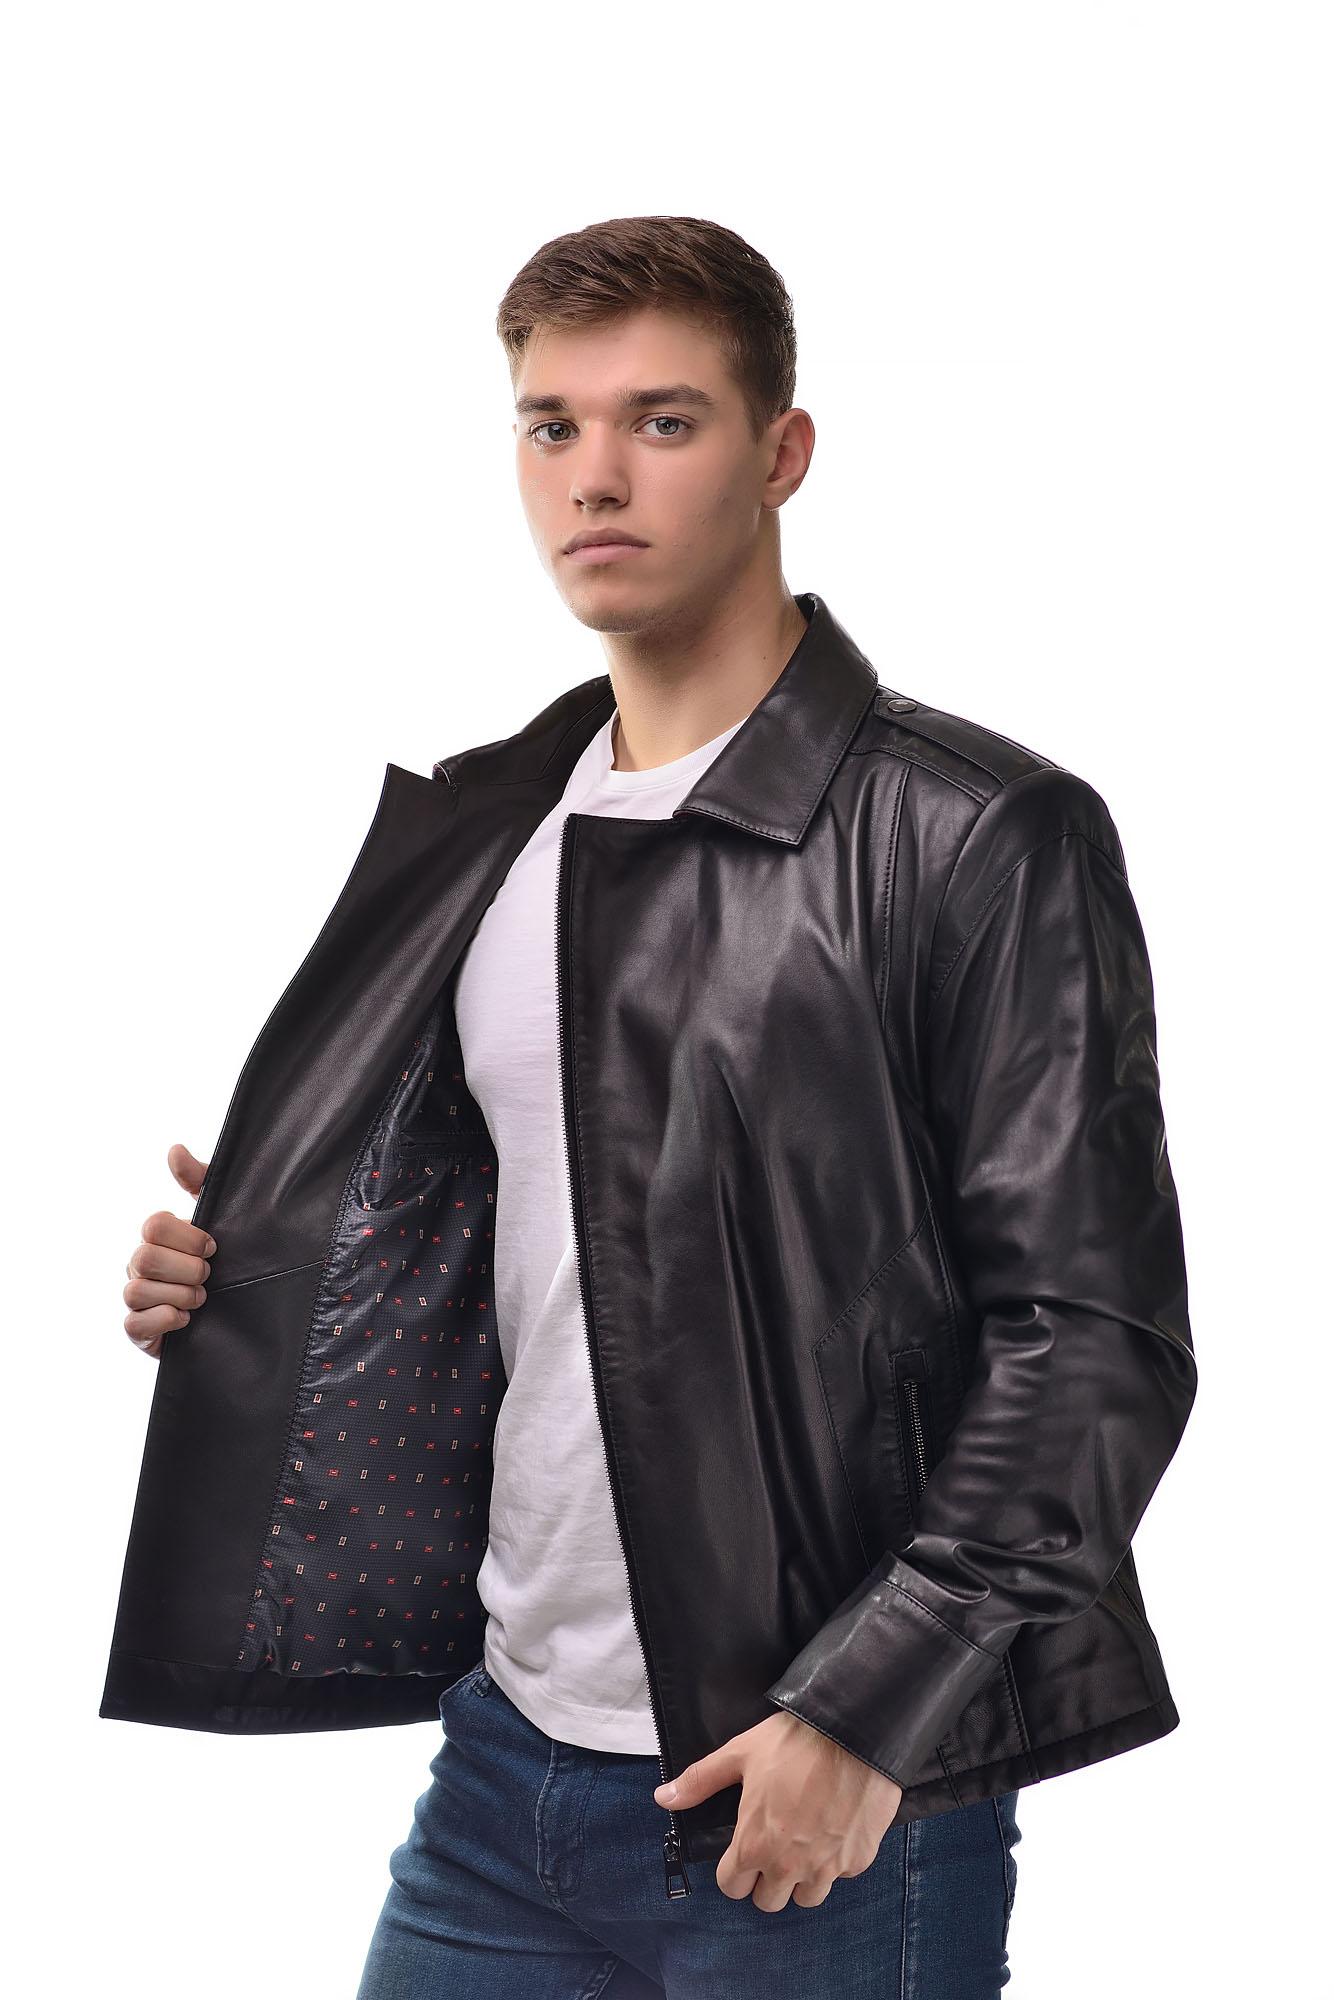 Мужская Кожаная куртка — косуха6116